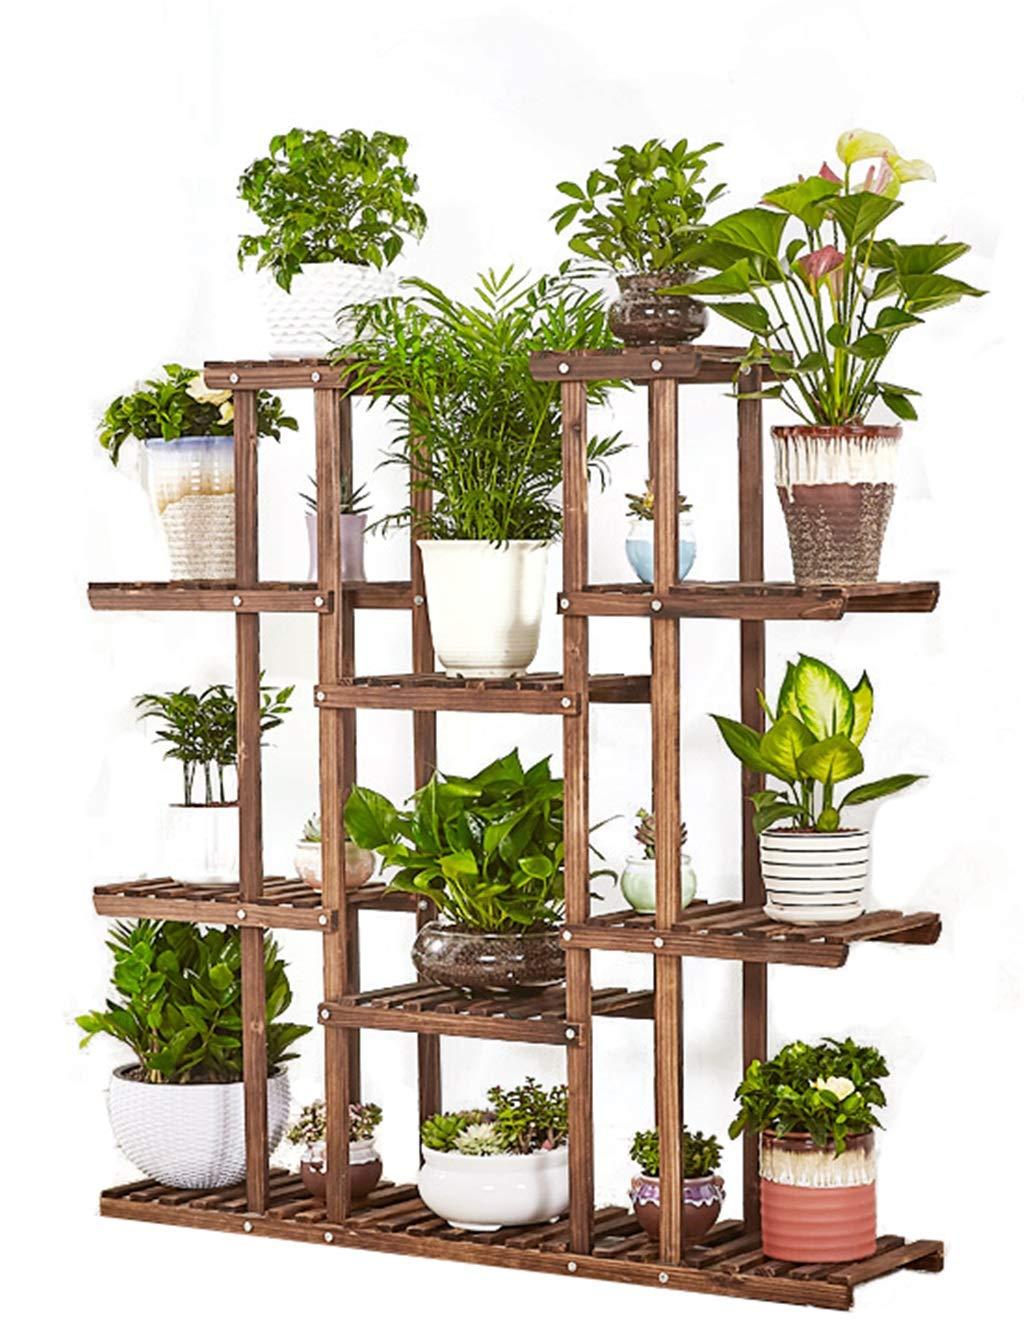 ZB フラワースタンド無垢材植物フレームリビングルームバルコニー多階フロア盆栽棚収納容量 A+ B07QN8Y29M